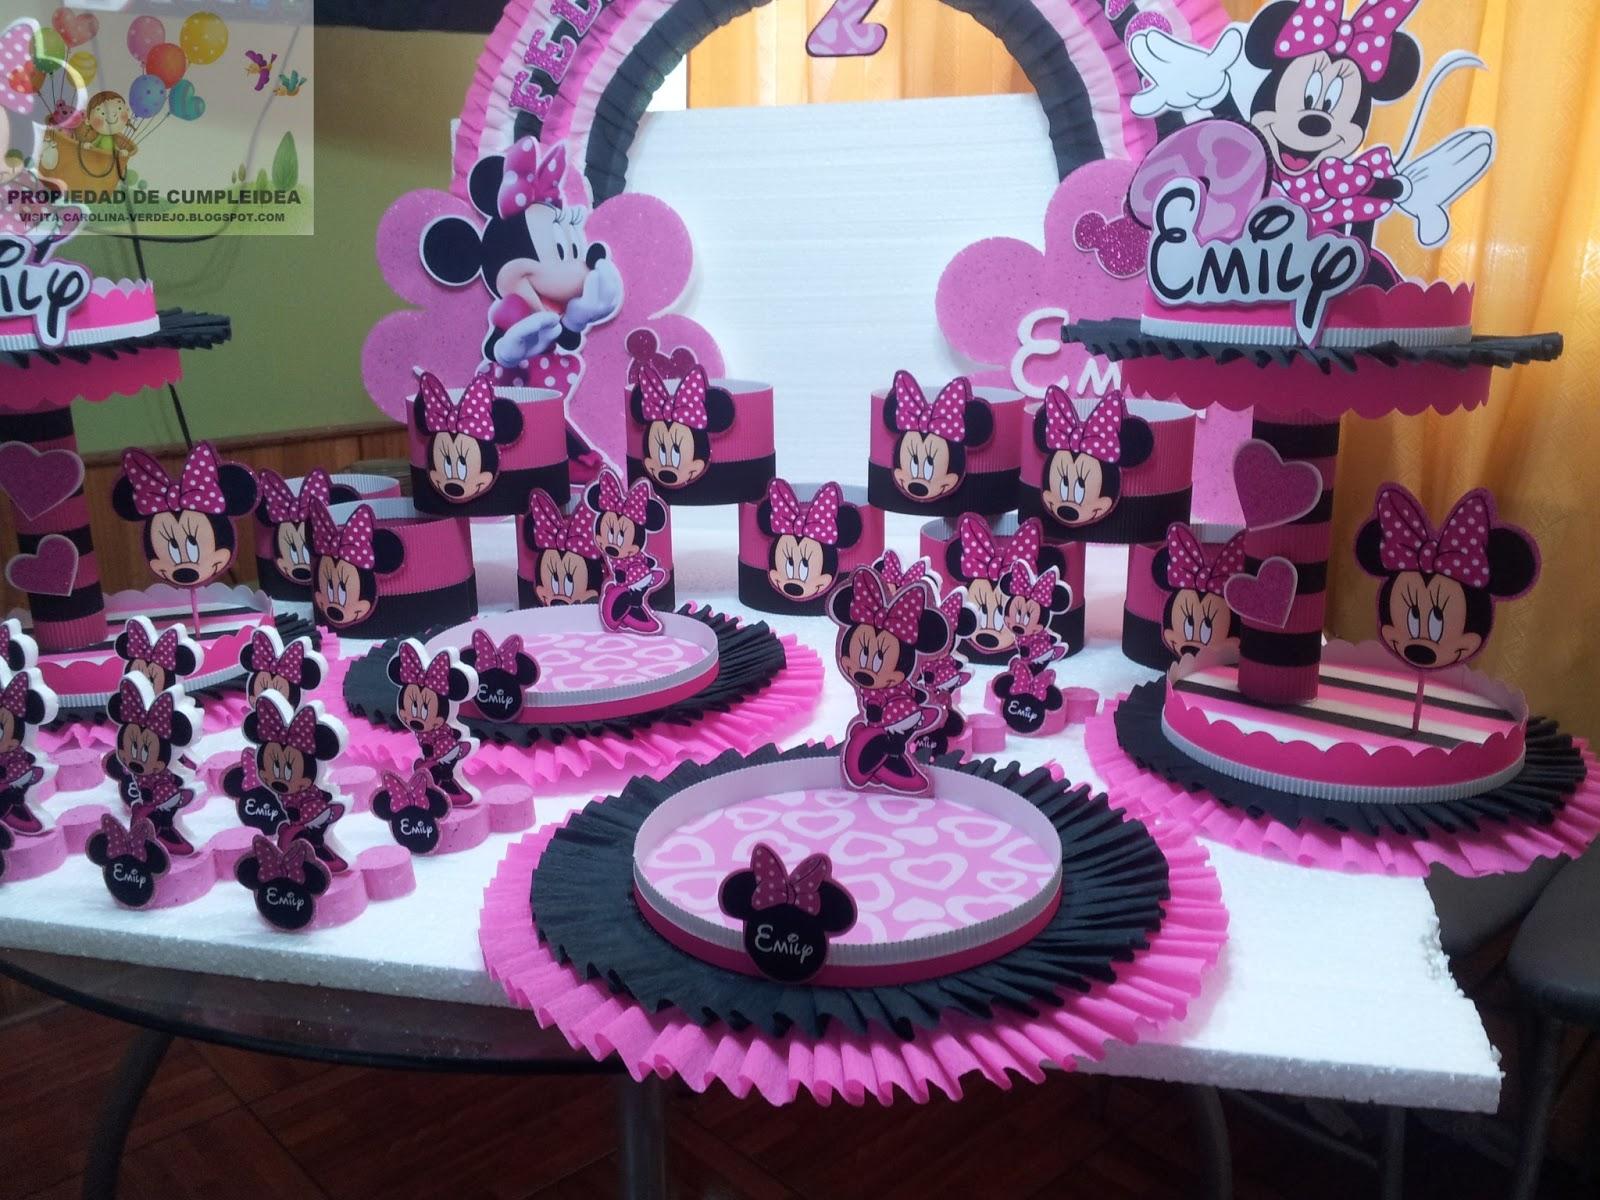 Decoraciones infantiles minnie mouse - Imagenes de decoracion de fiestas infantiles ...